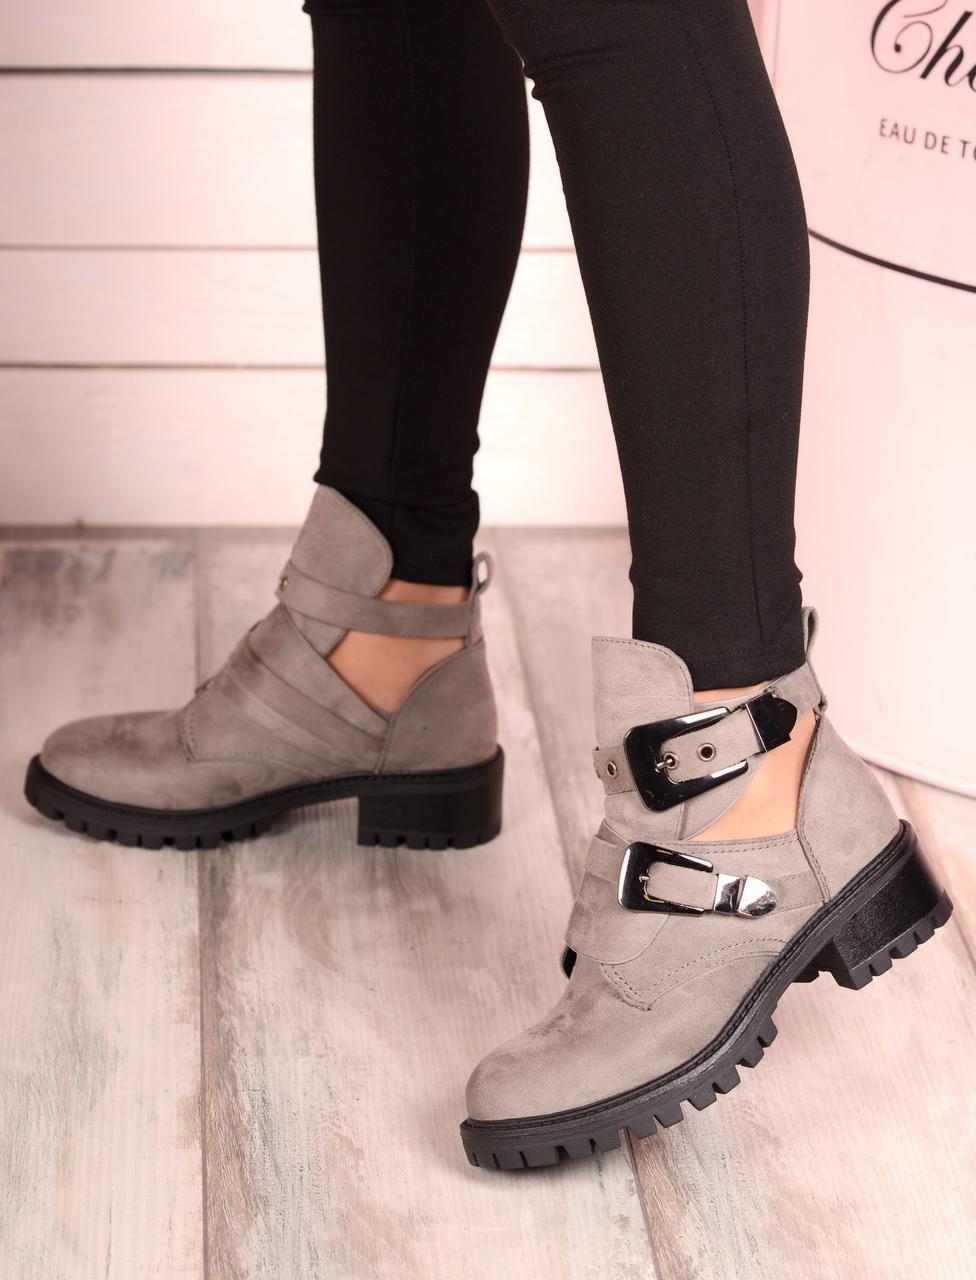 Серые ботинки Michael Kors. Аналог